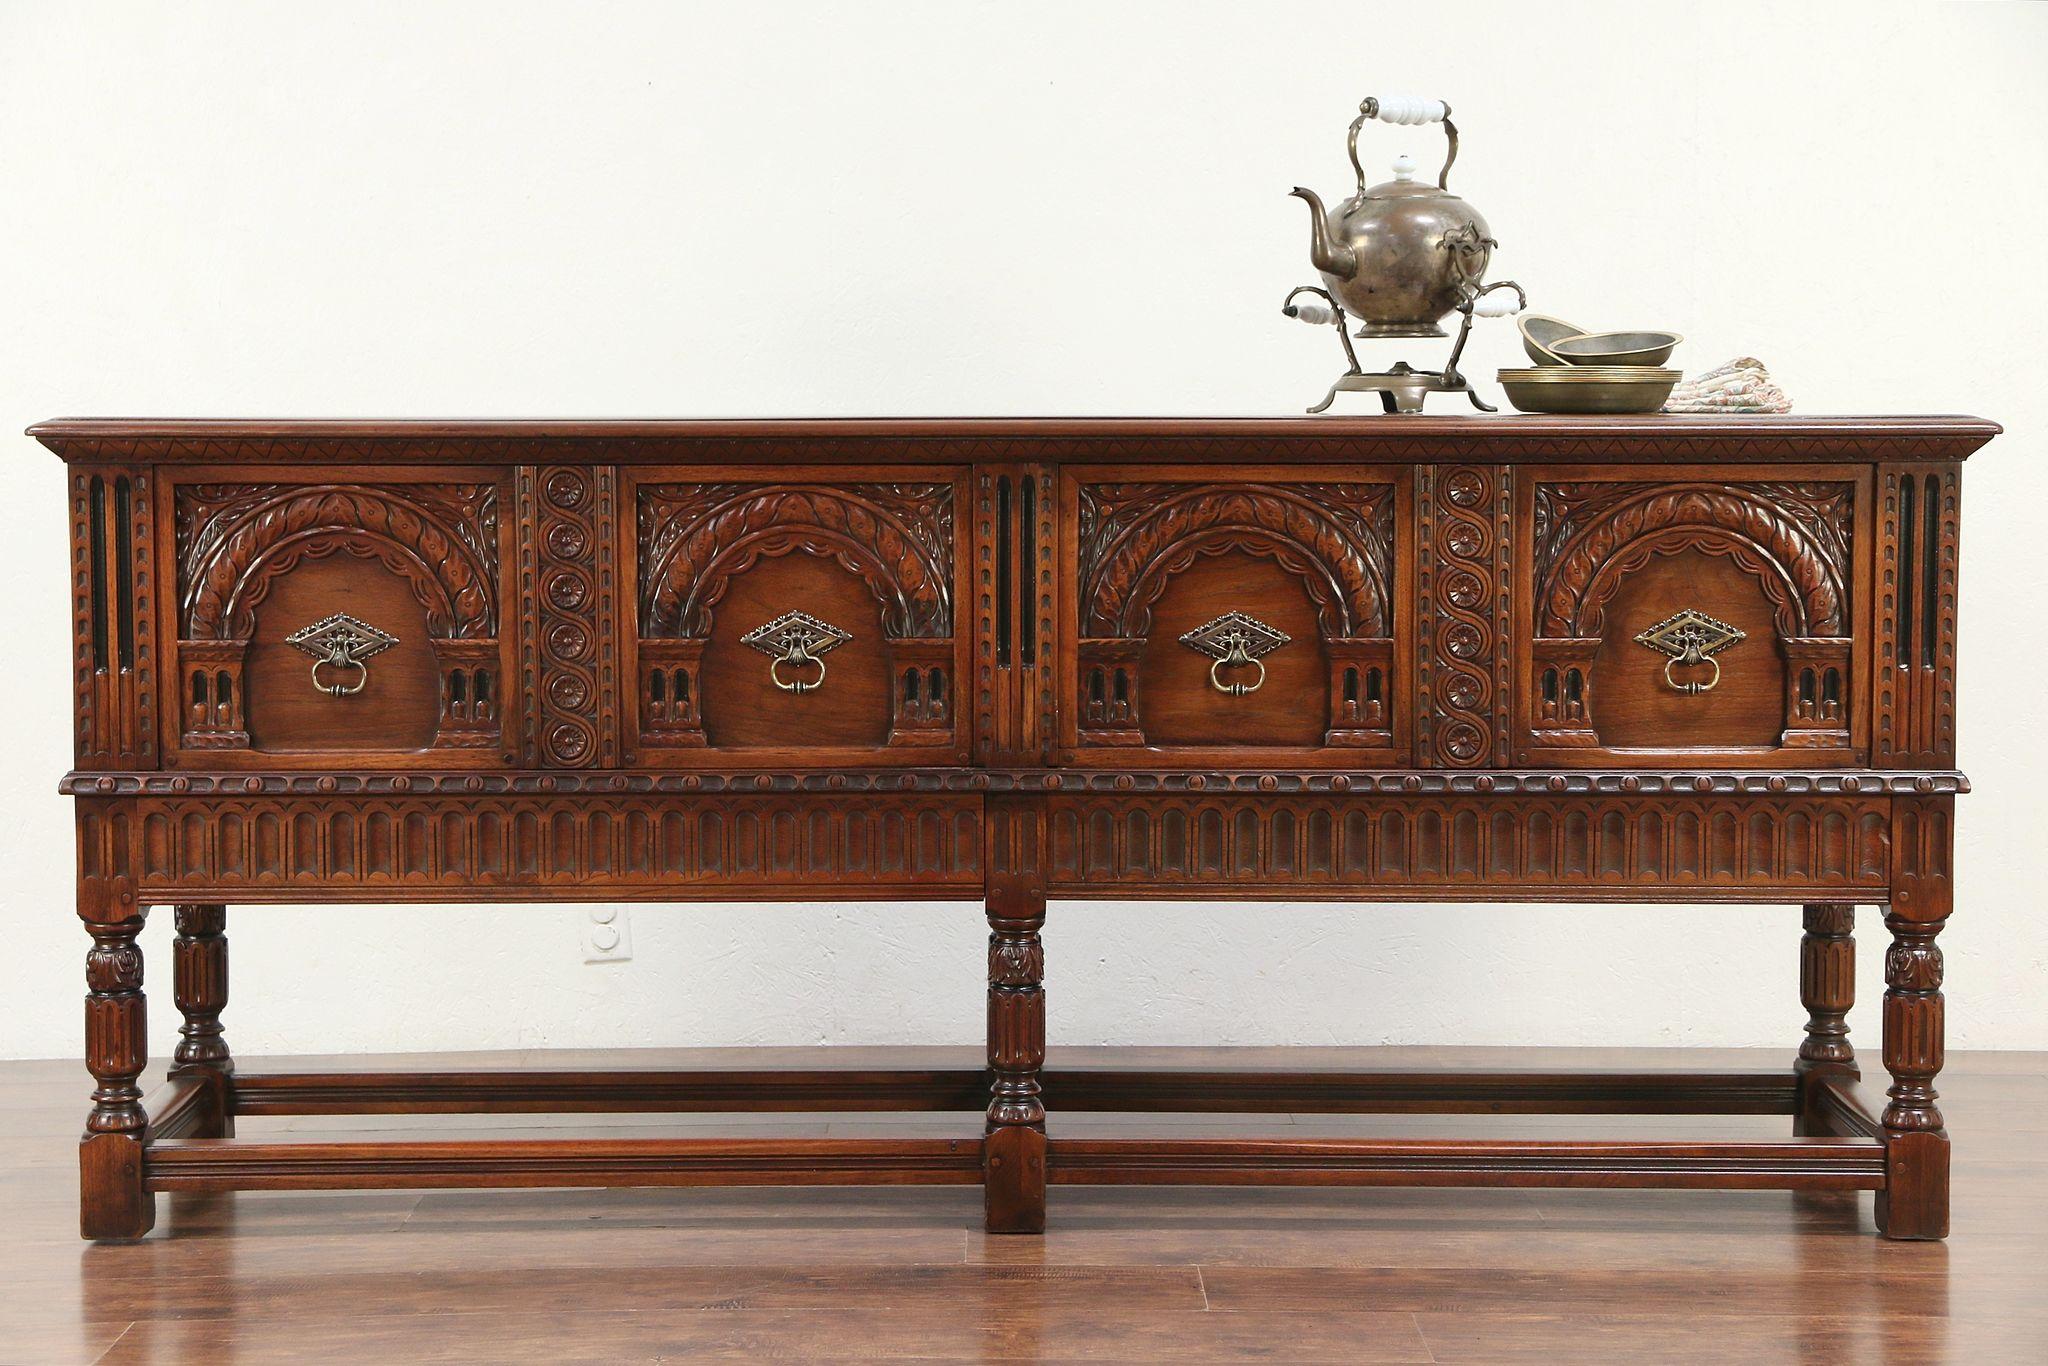 English Renaissance Antique Walnut Sideboard, Buffet Or Server, Kittinger  #29555 ...